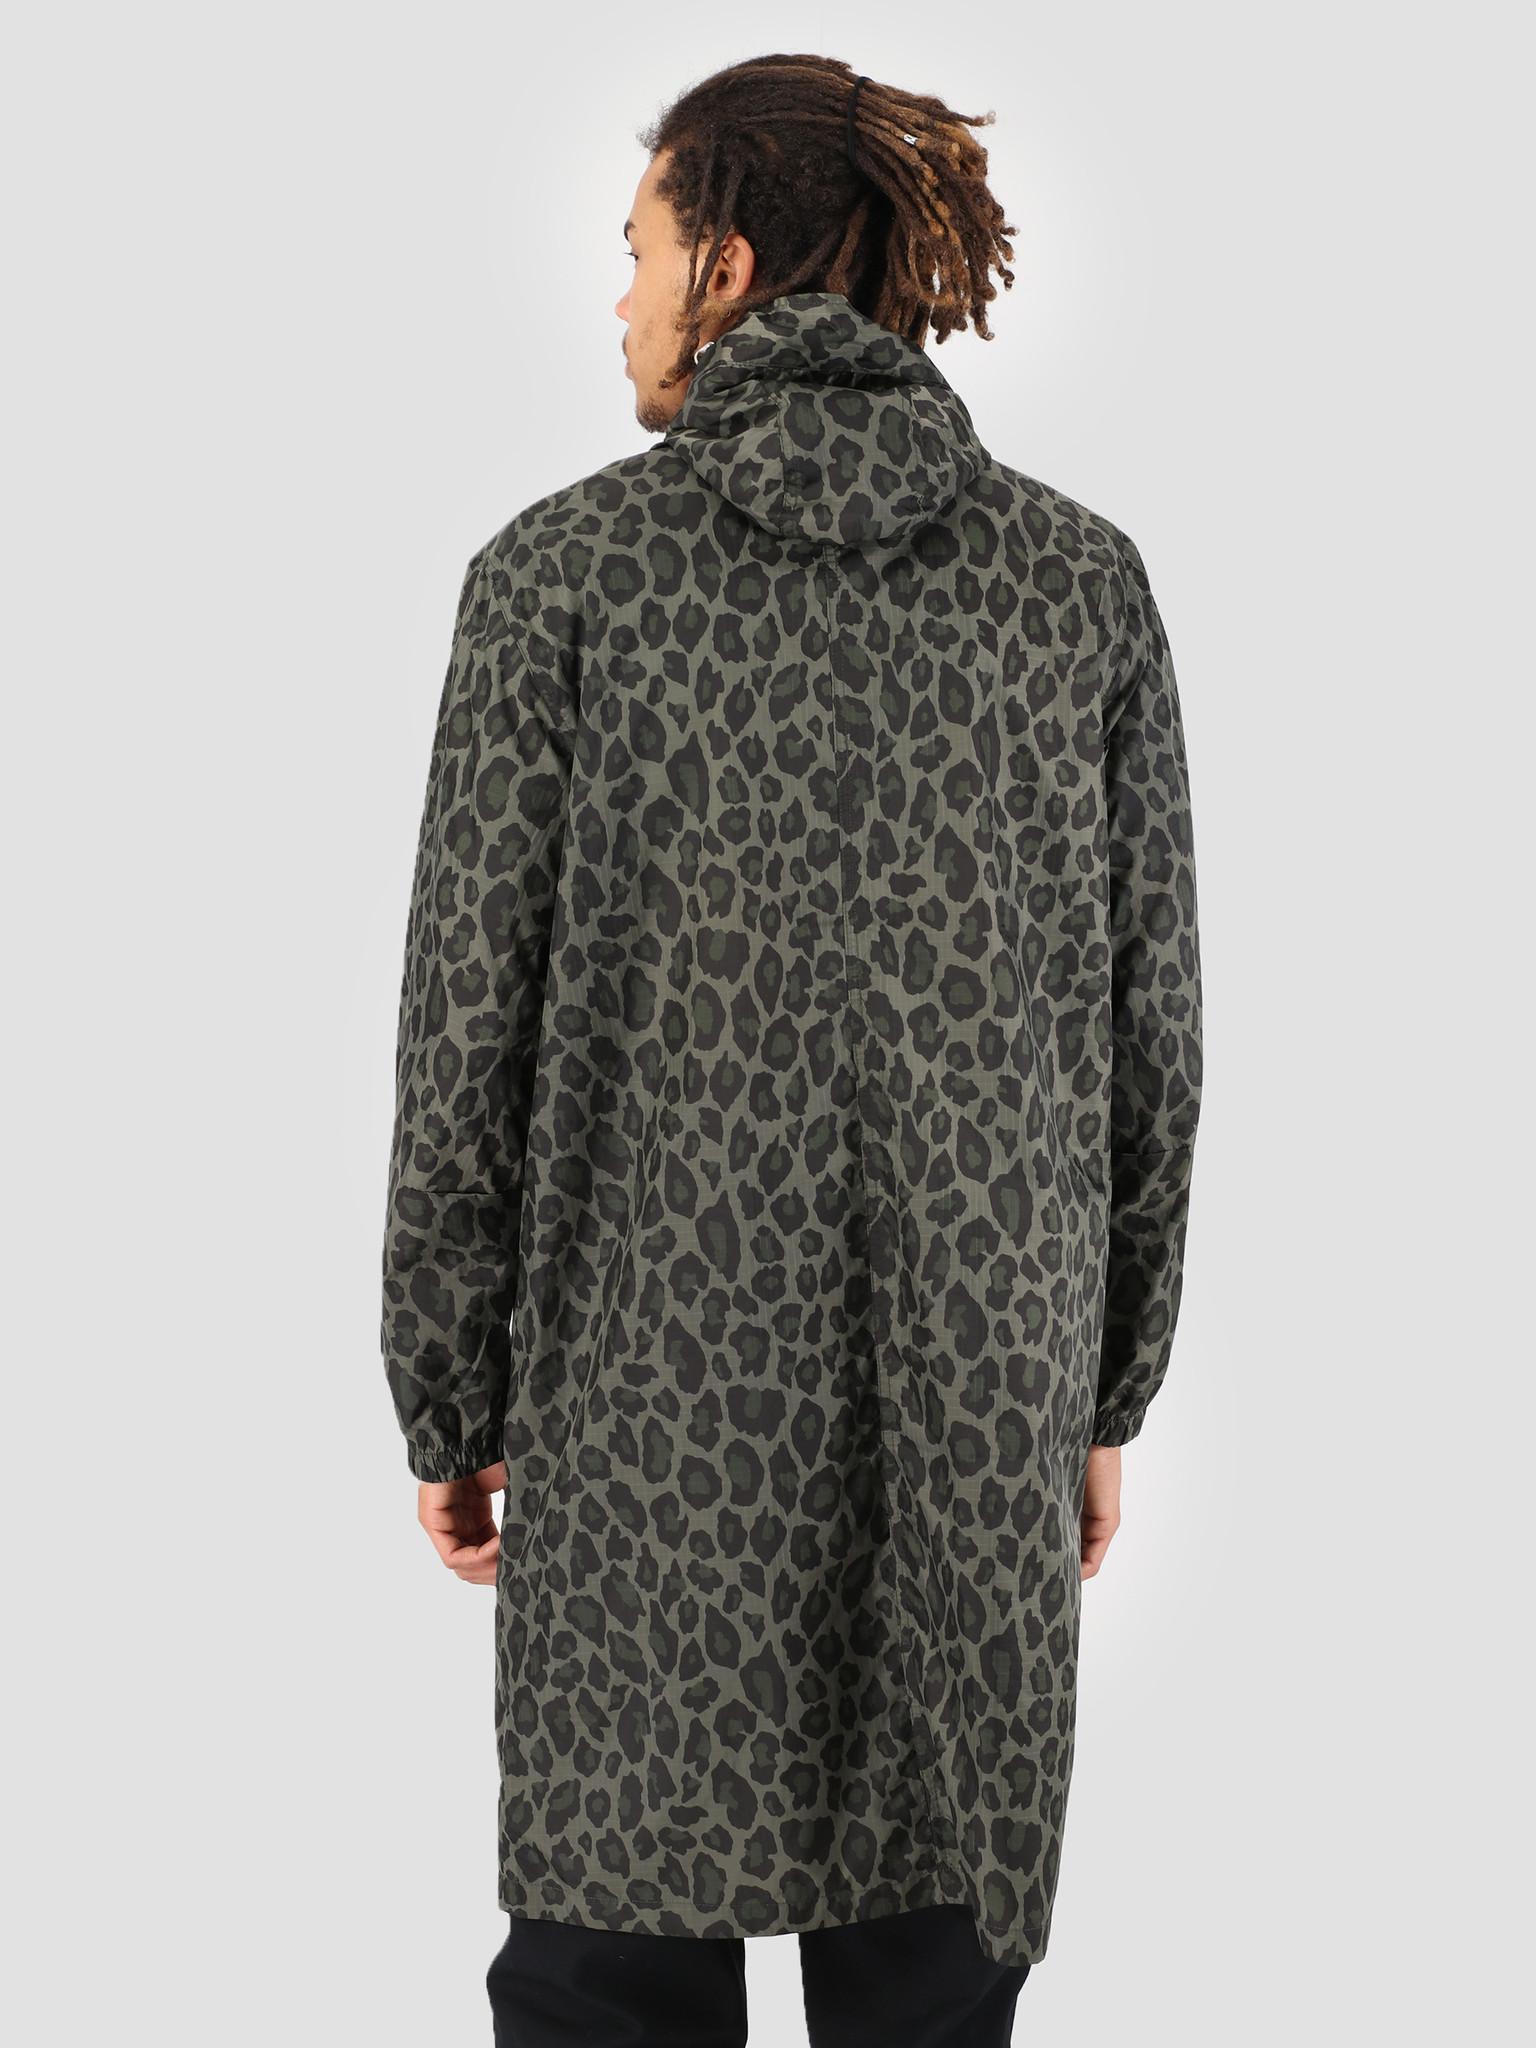 5fa41dab2515 Stussy Ripstop Parka Leopard 923 | FRESHCOTTON